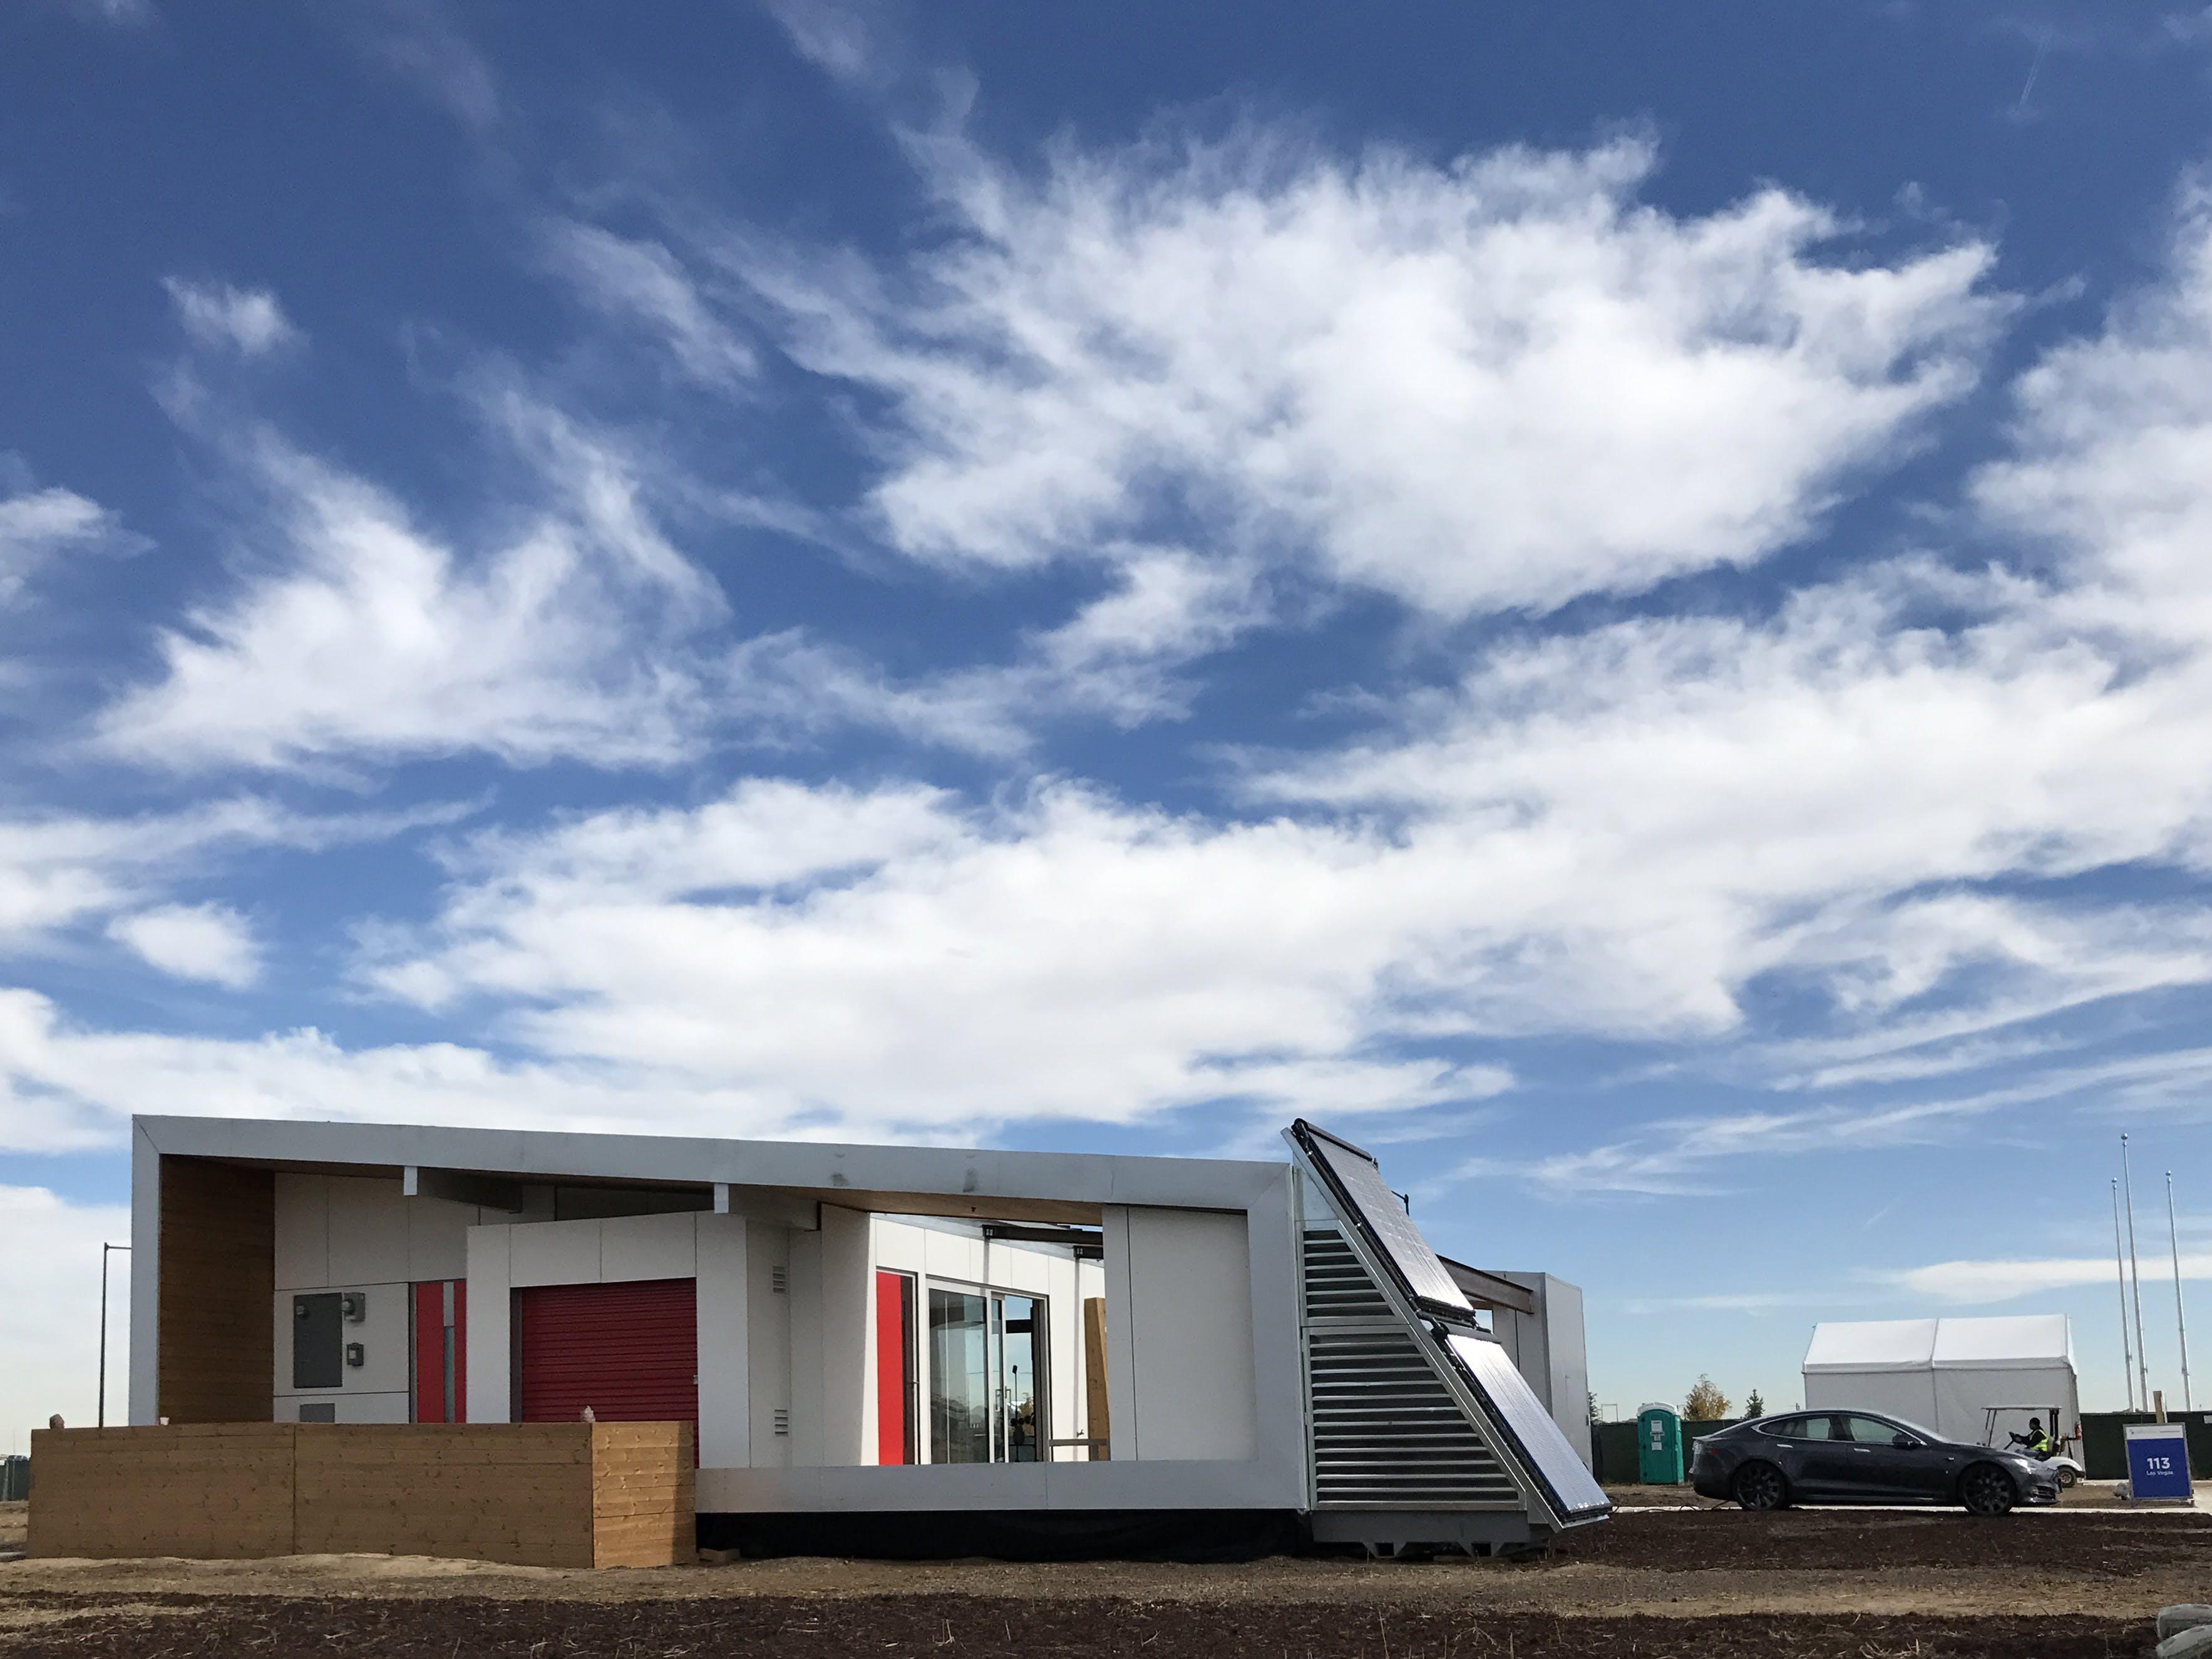 The solar decathlon competition showcases cutting edge for Edge house design